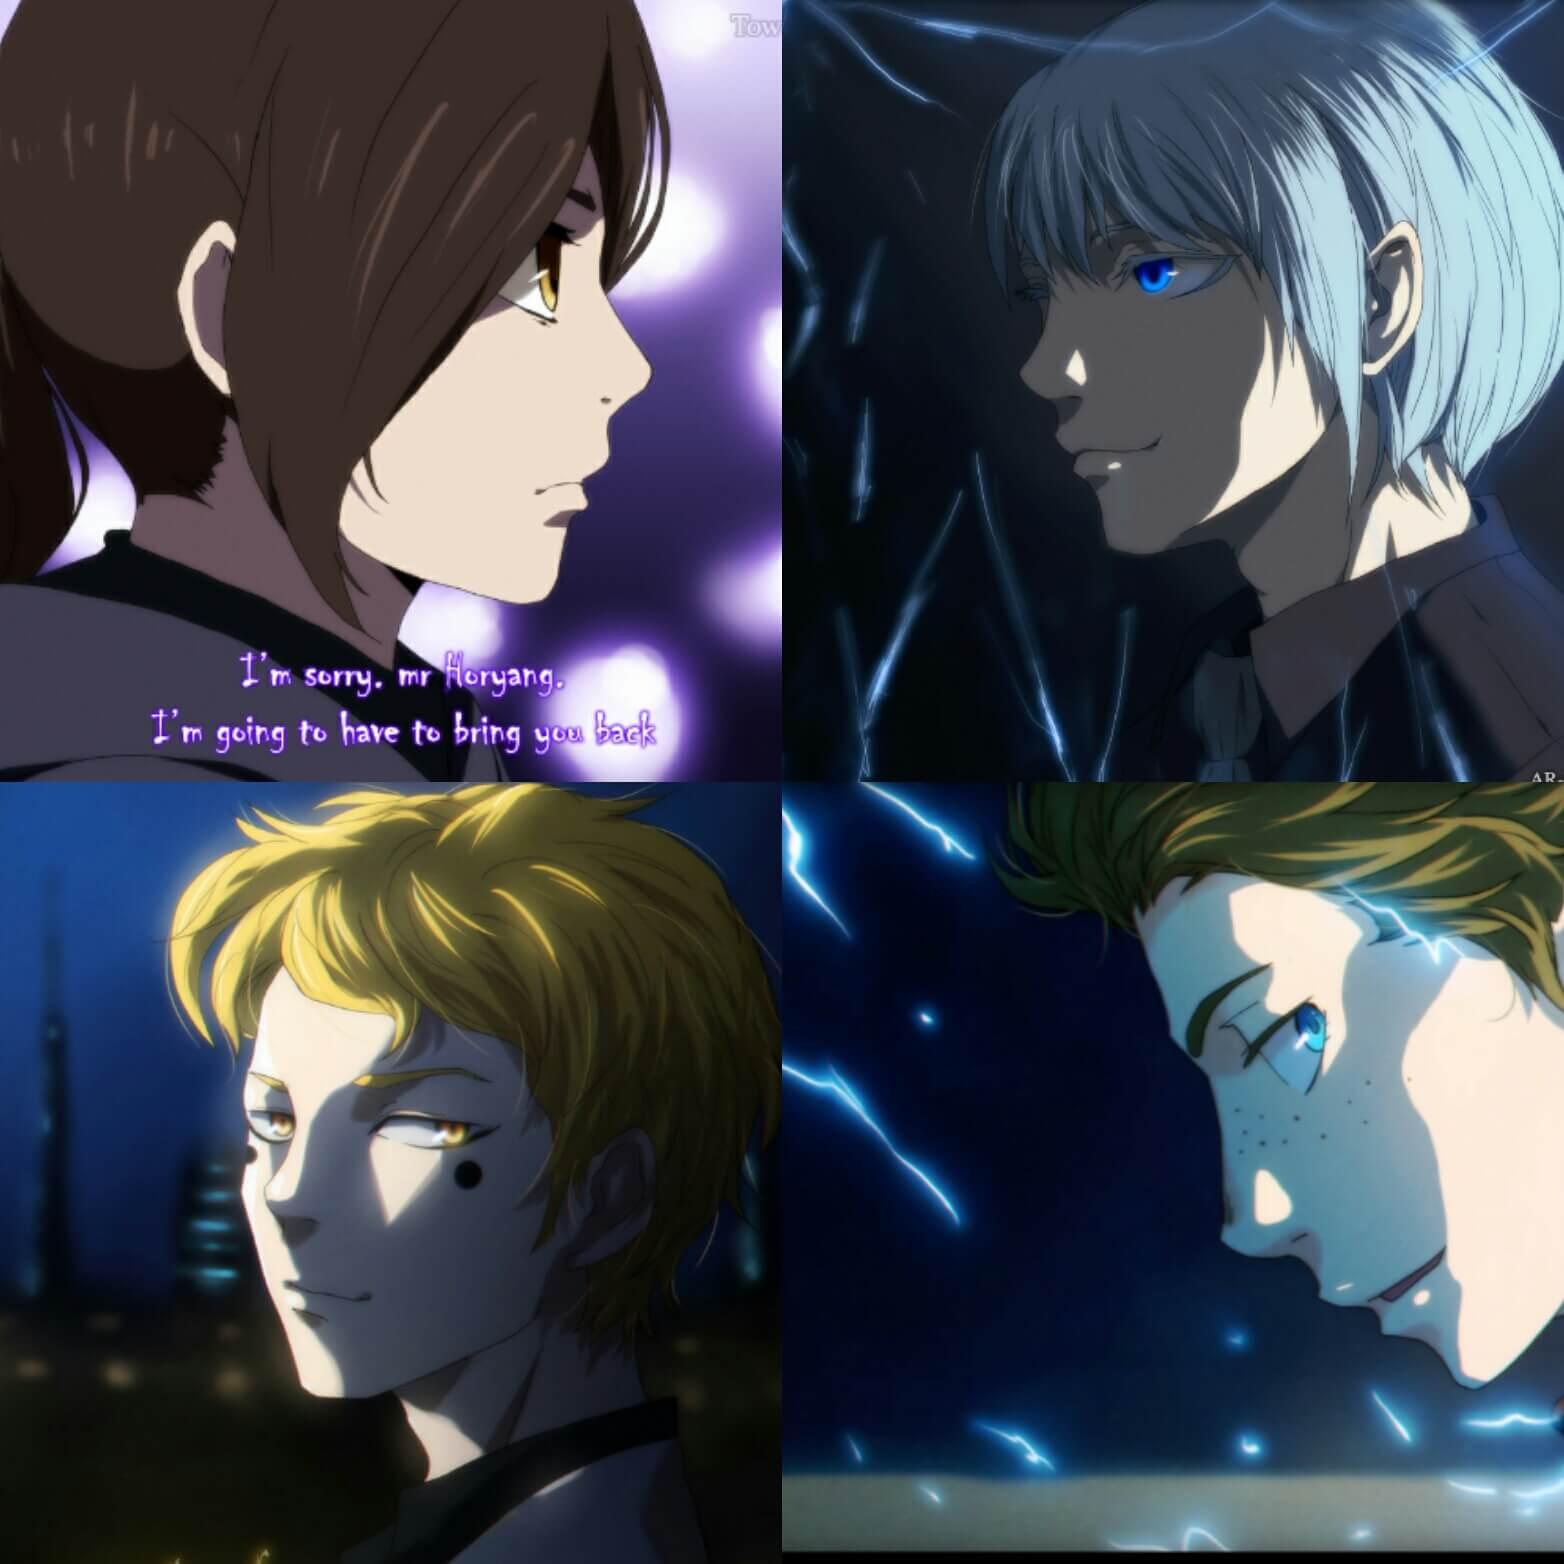 Petisi Animasi Tower of God Anime Netflix - Tower of God